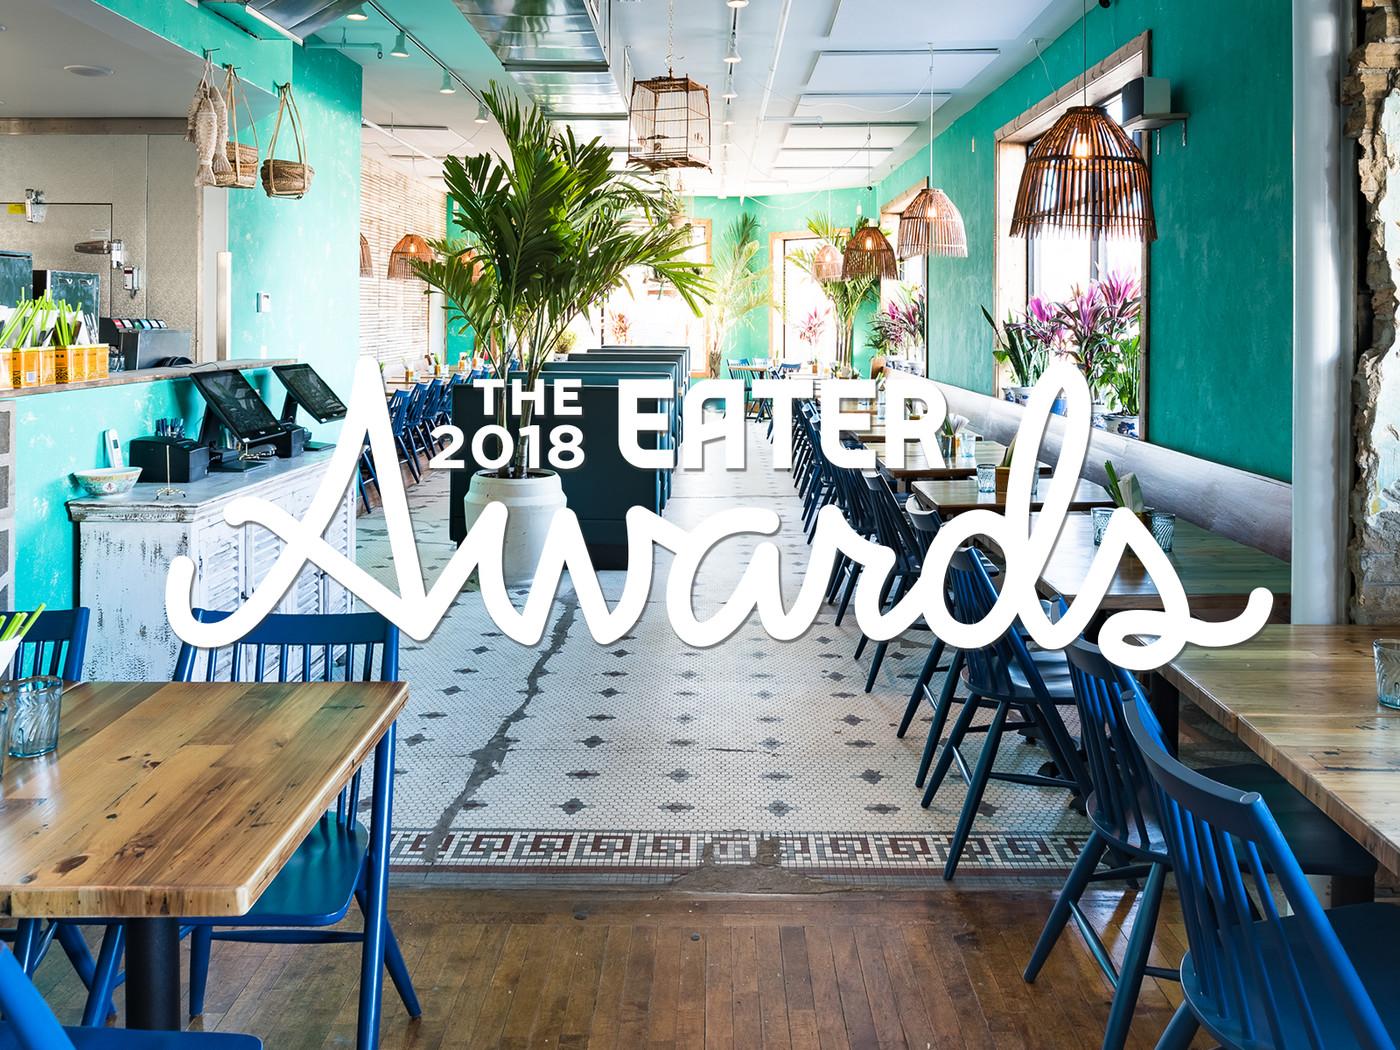 Twin Cities Eater Award Winners 2018 Eater Twin Cities